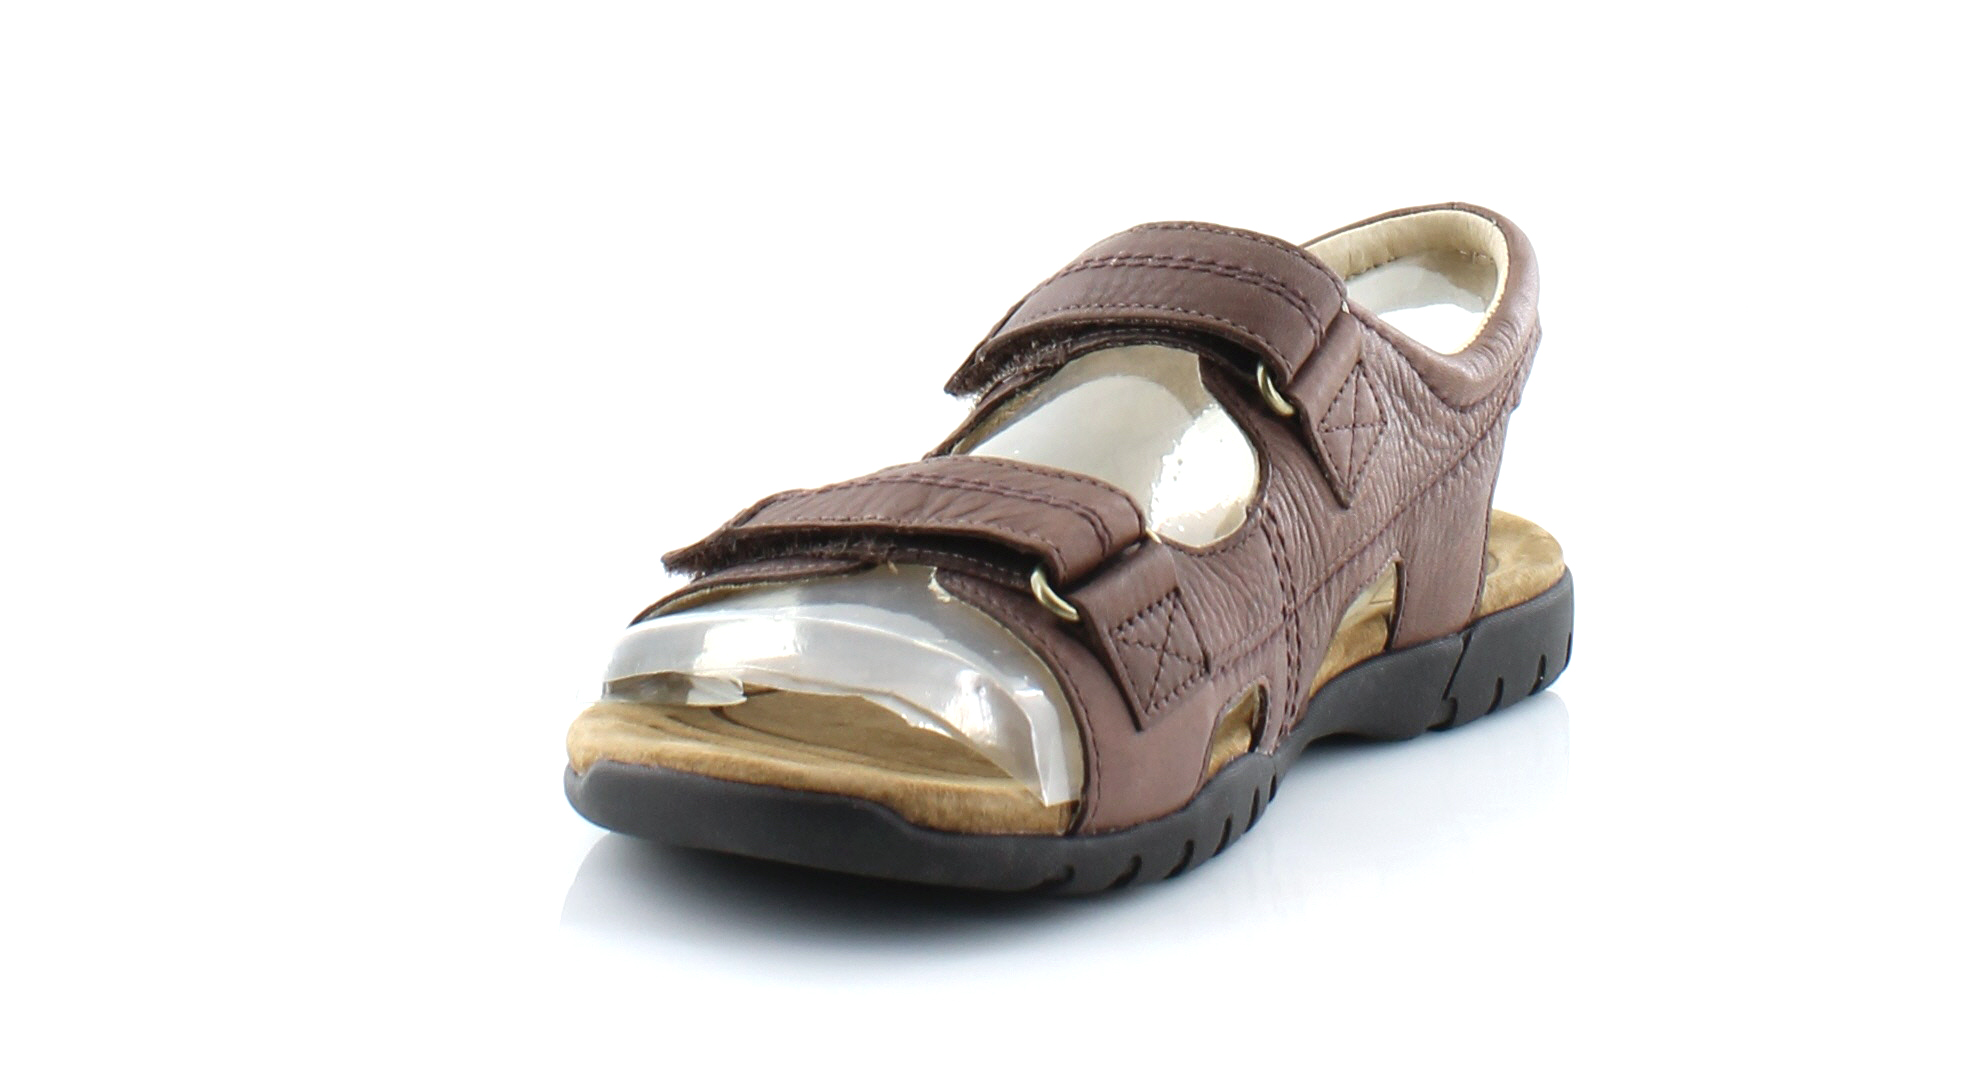 Shoe Stores Port Richey Fl